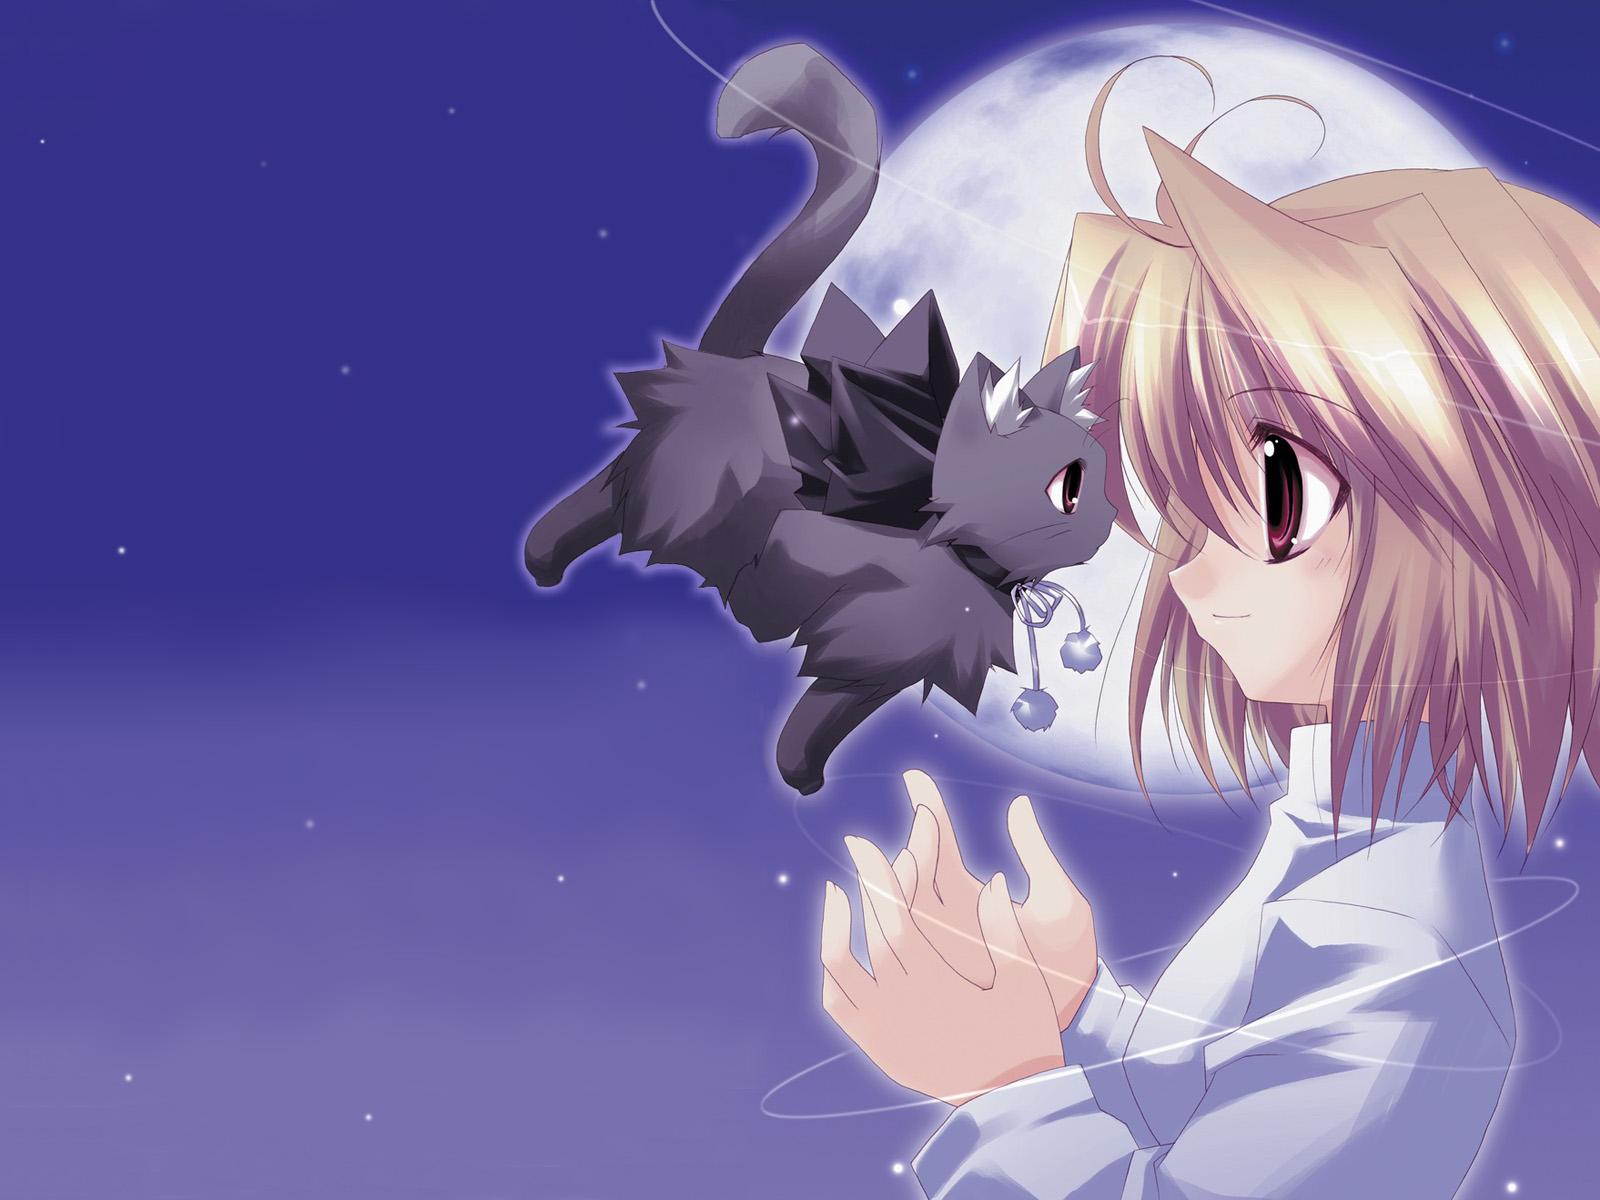 http://1.bp.blogspot.com/-x23l5Nt7uJY/TwgvgJV0lsI/AAAAAAAABKw/O3QmLA2VfLs/s1600/Anime+Wallpaper+4.jpg